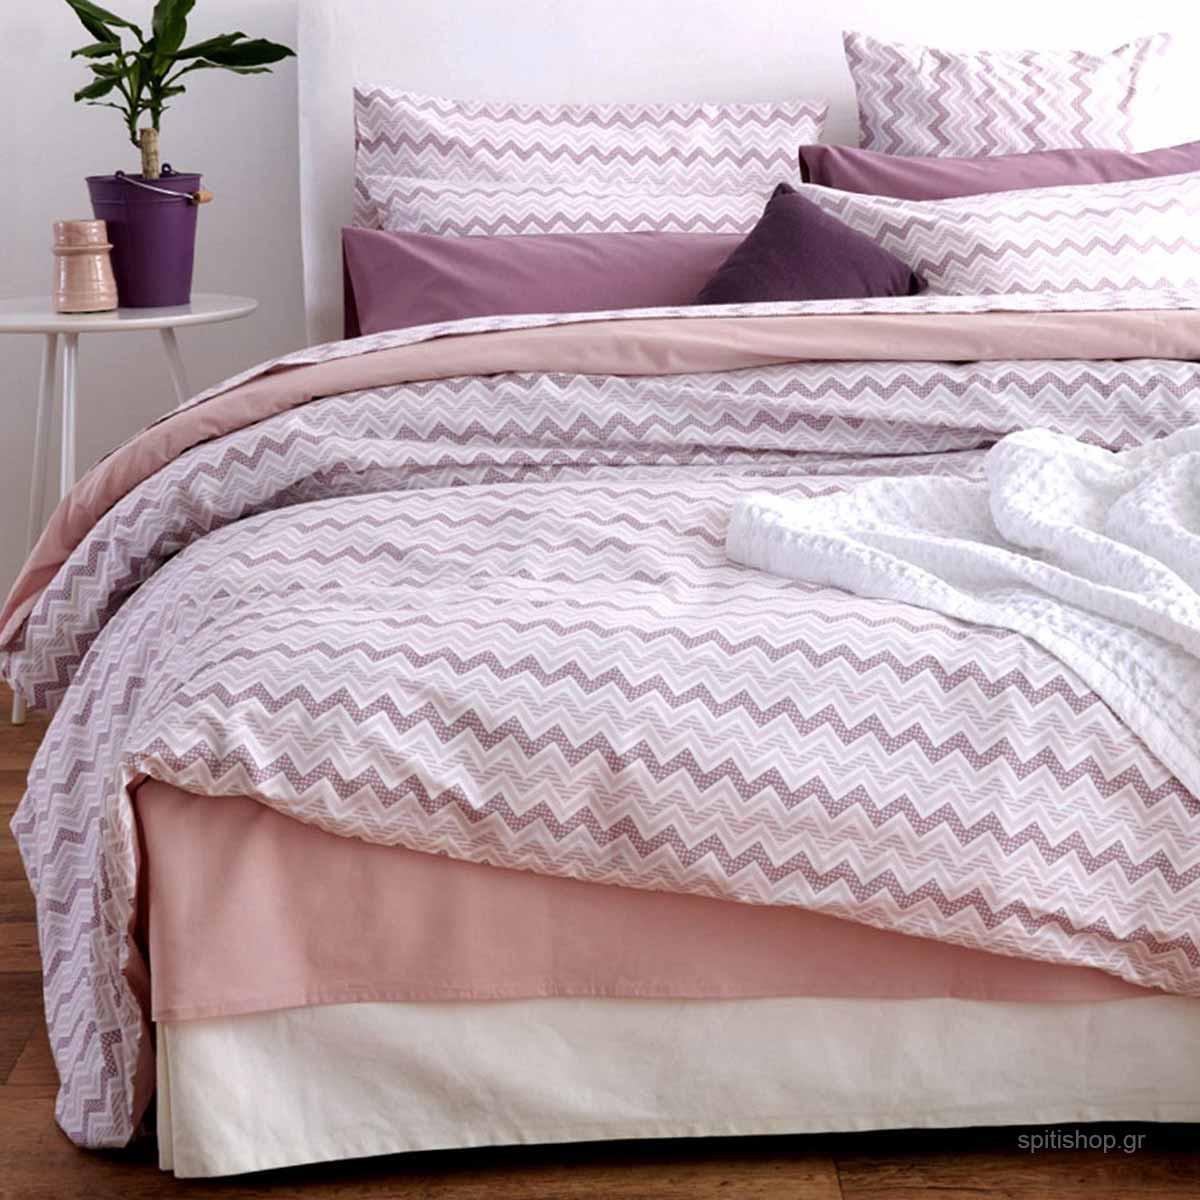 e298e7f69ed -40% Spiti Shop Σεντόνια Μονά (Σετ) Sb Home Waves Pink